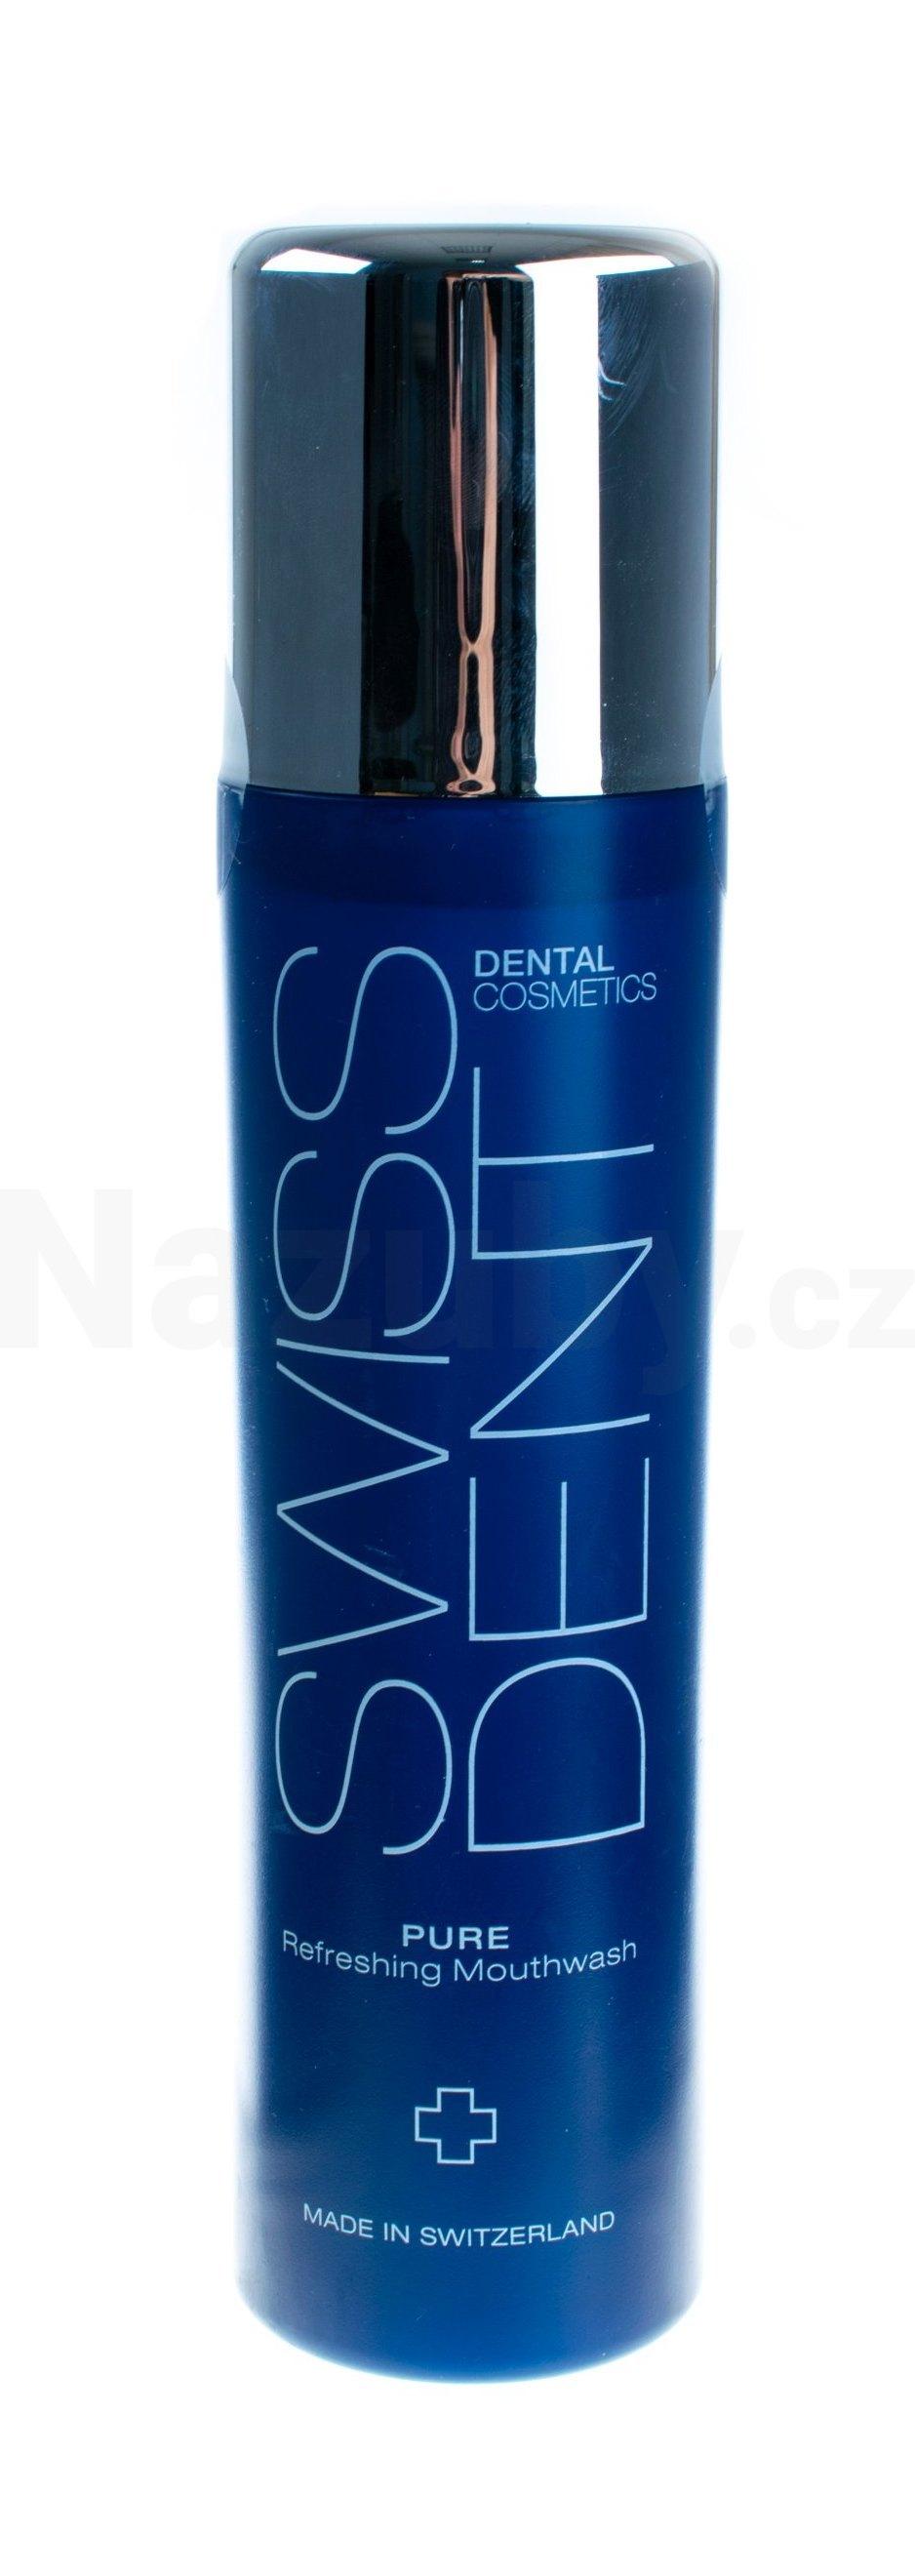 SWISSDENT Pure ústní voda 300 ml